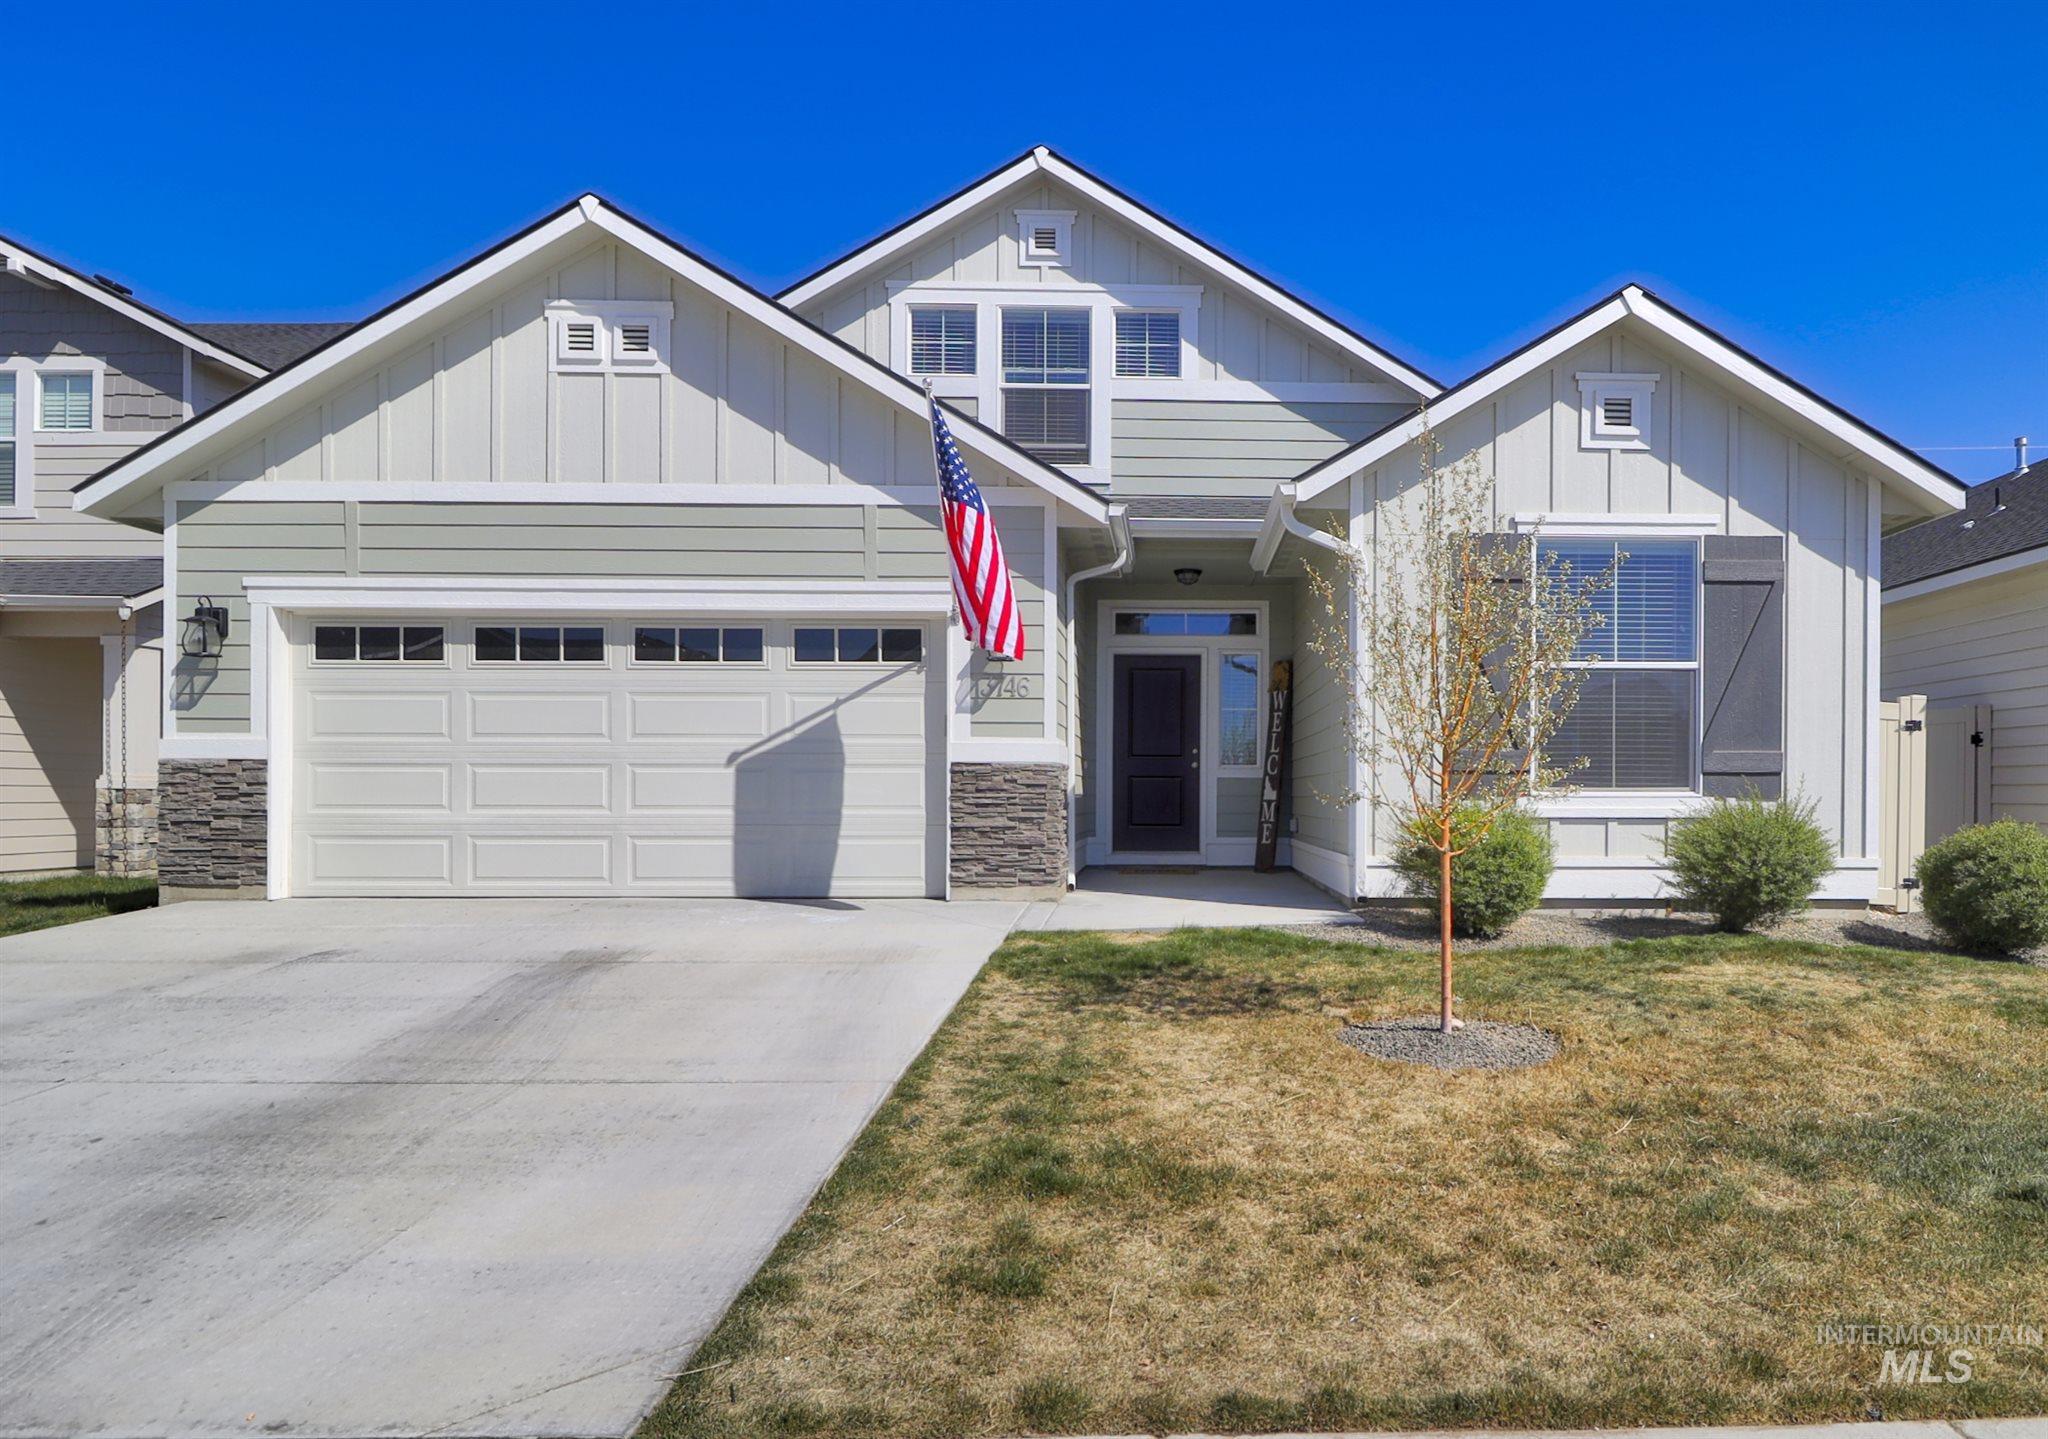 3746 W Peak Cloud Ct Property Photo - Meridian, ID real estate listing